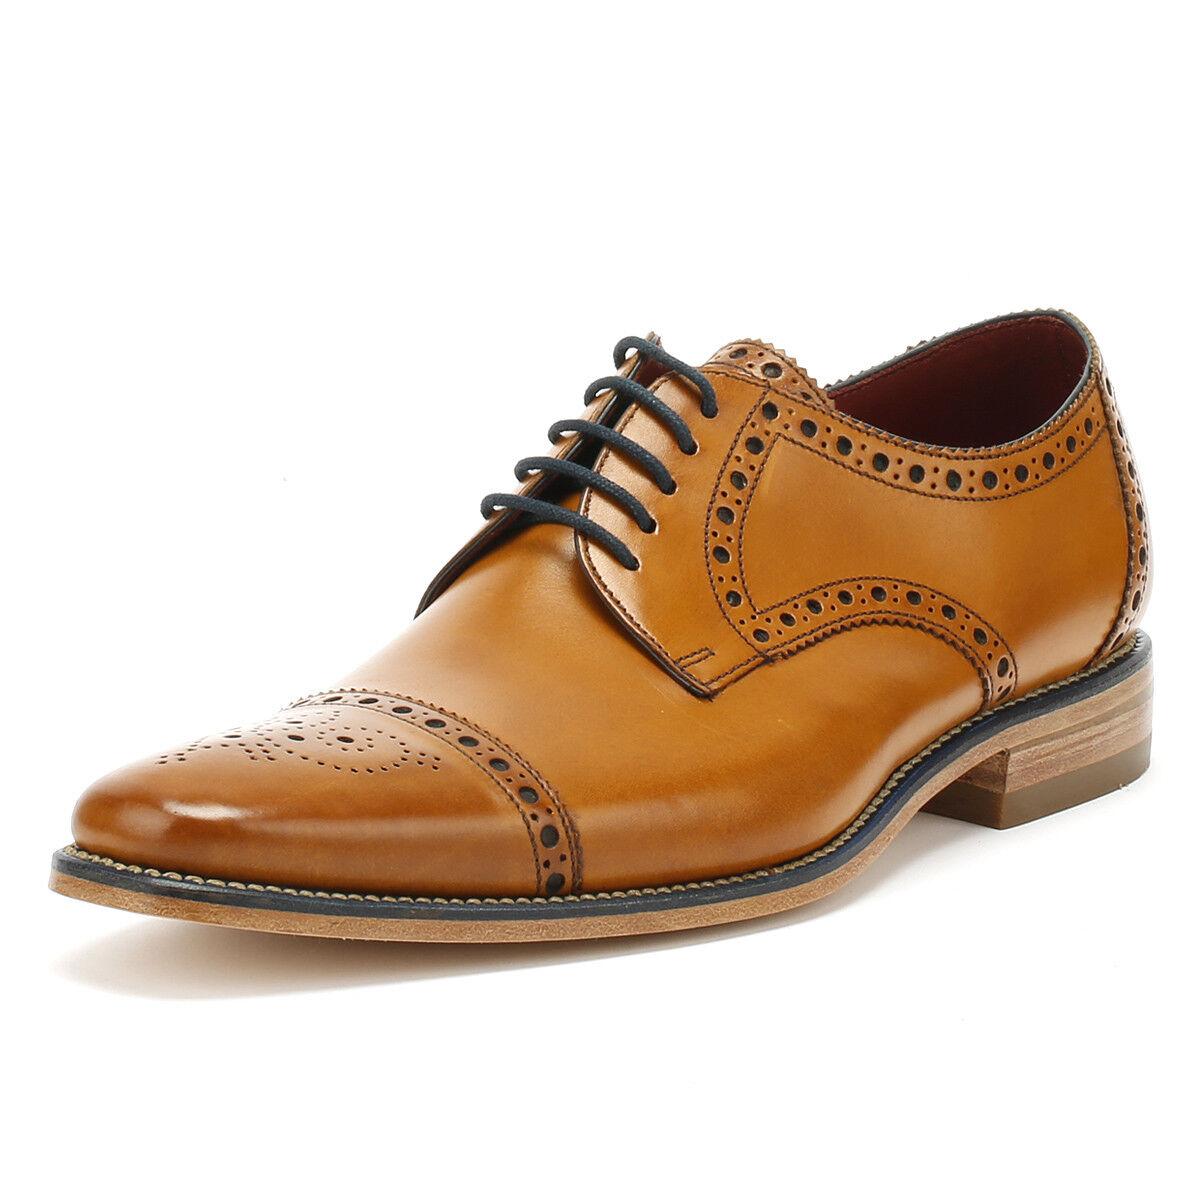 Loake Mens Tan braun Calf Leather Foley Brogue Formal schuhe